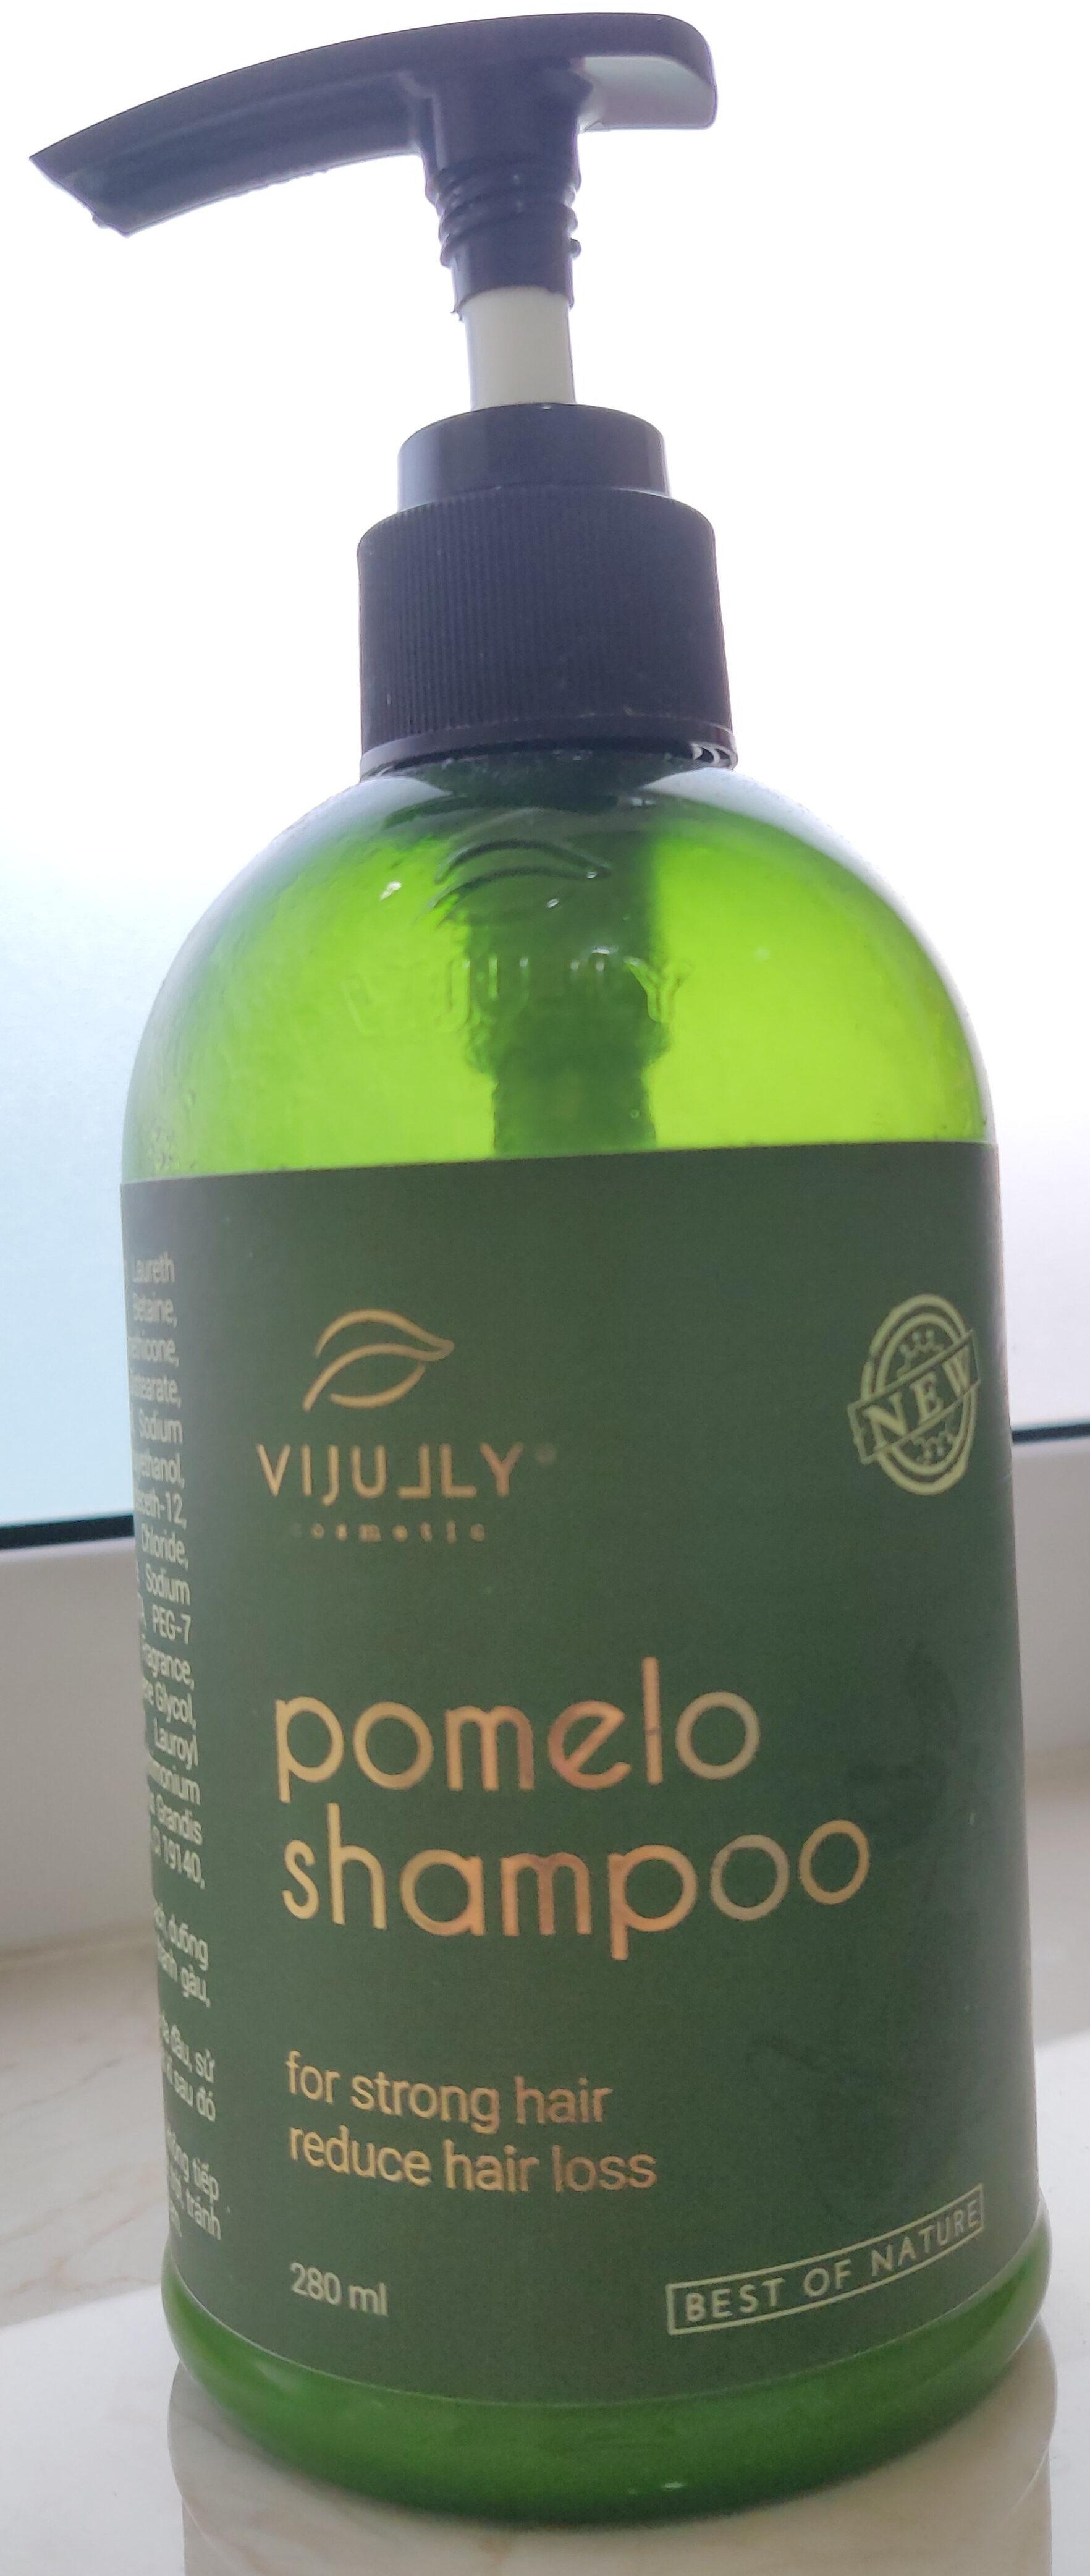 pomelo shampoo - Produit - vi